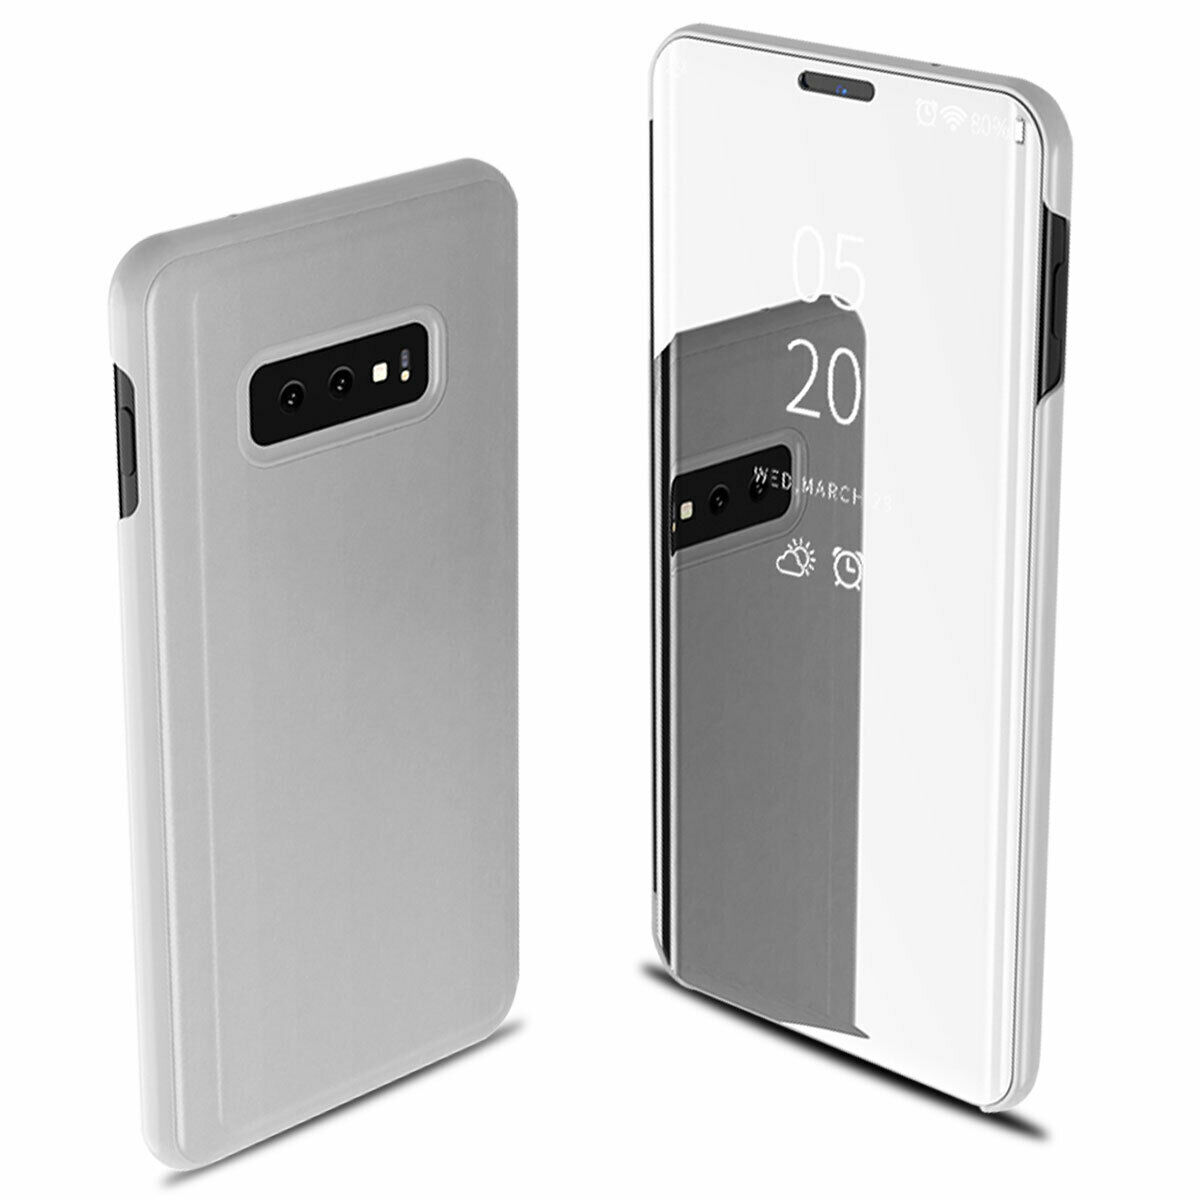 For Samsung Galaxy S10/S10 Plus/S10E Smart Leather Flip Mirror 360 Phone Case Cover Silver